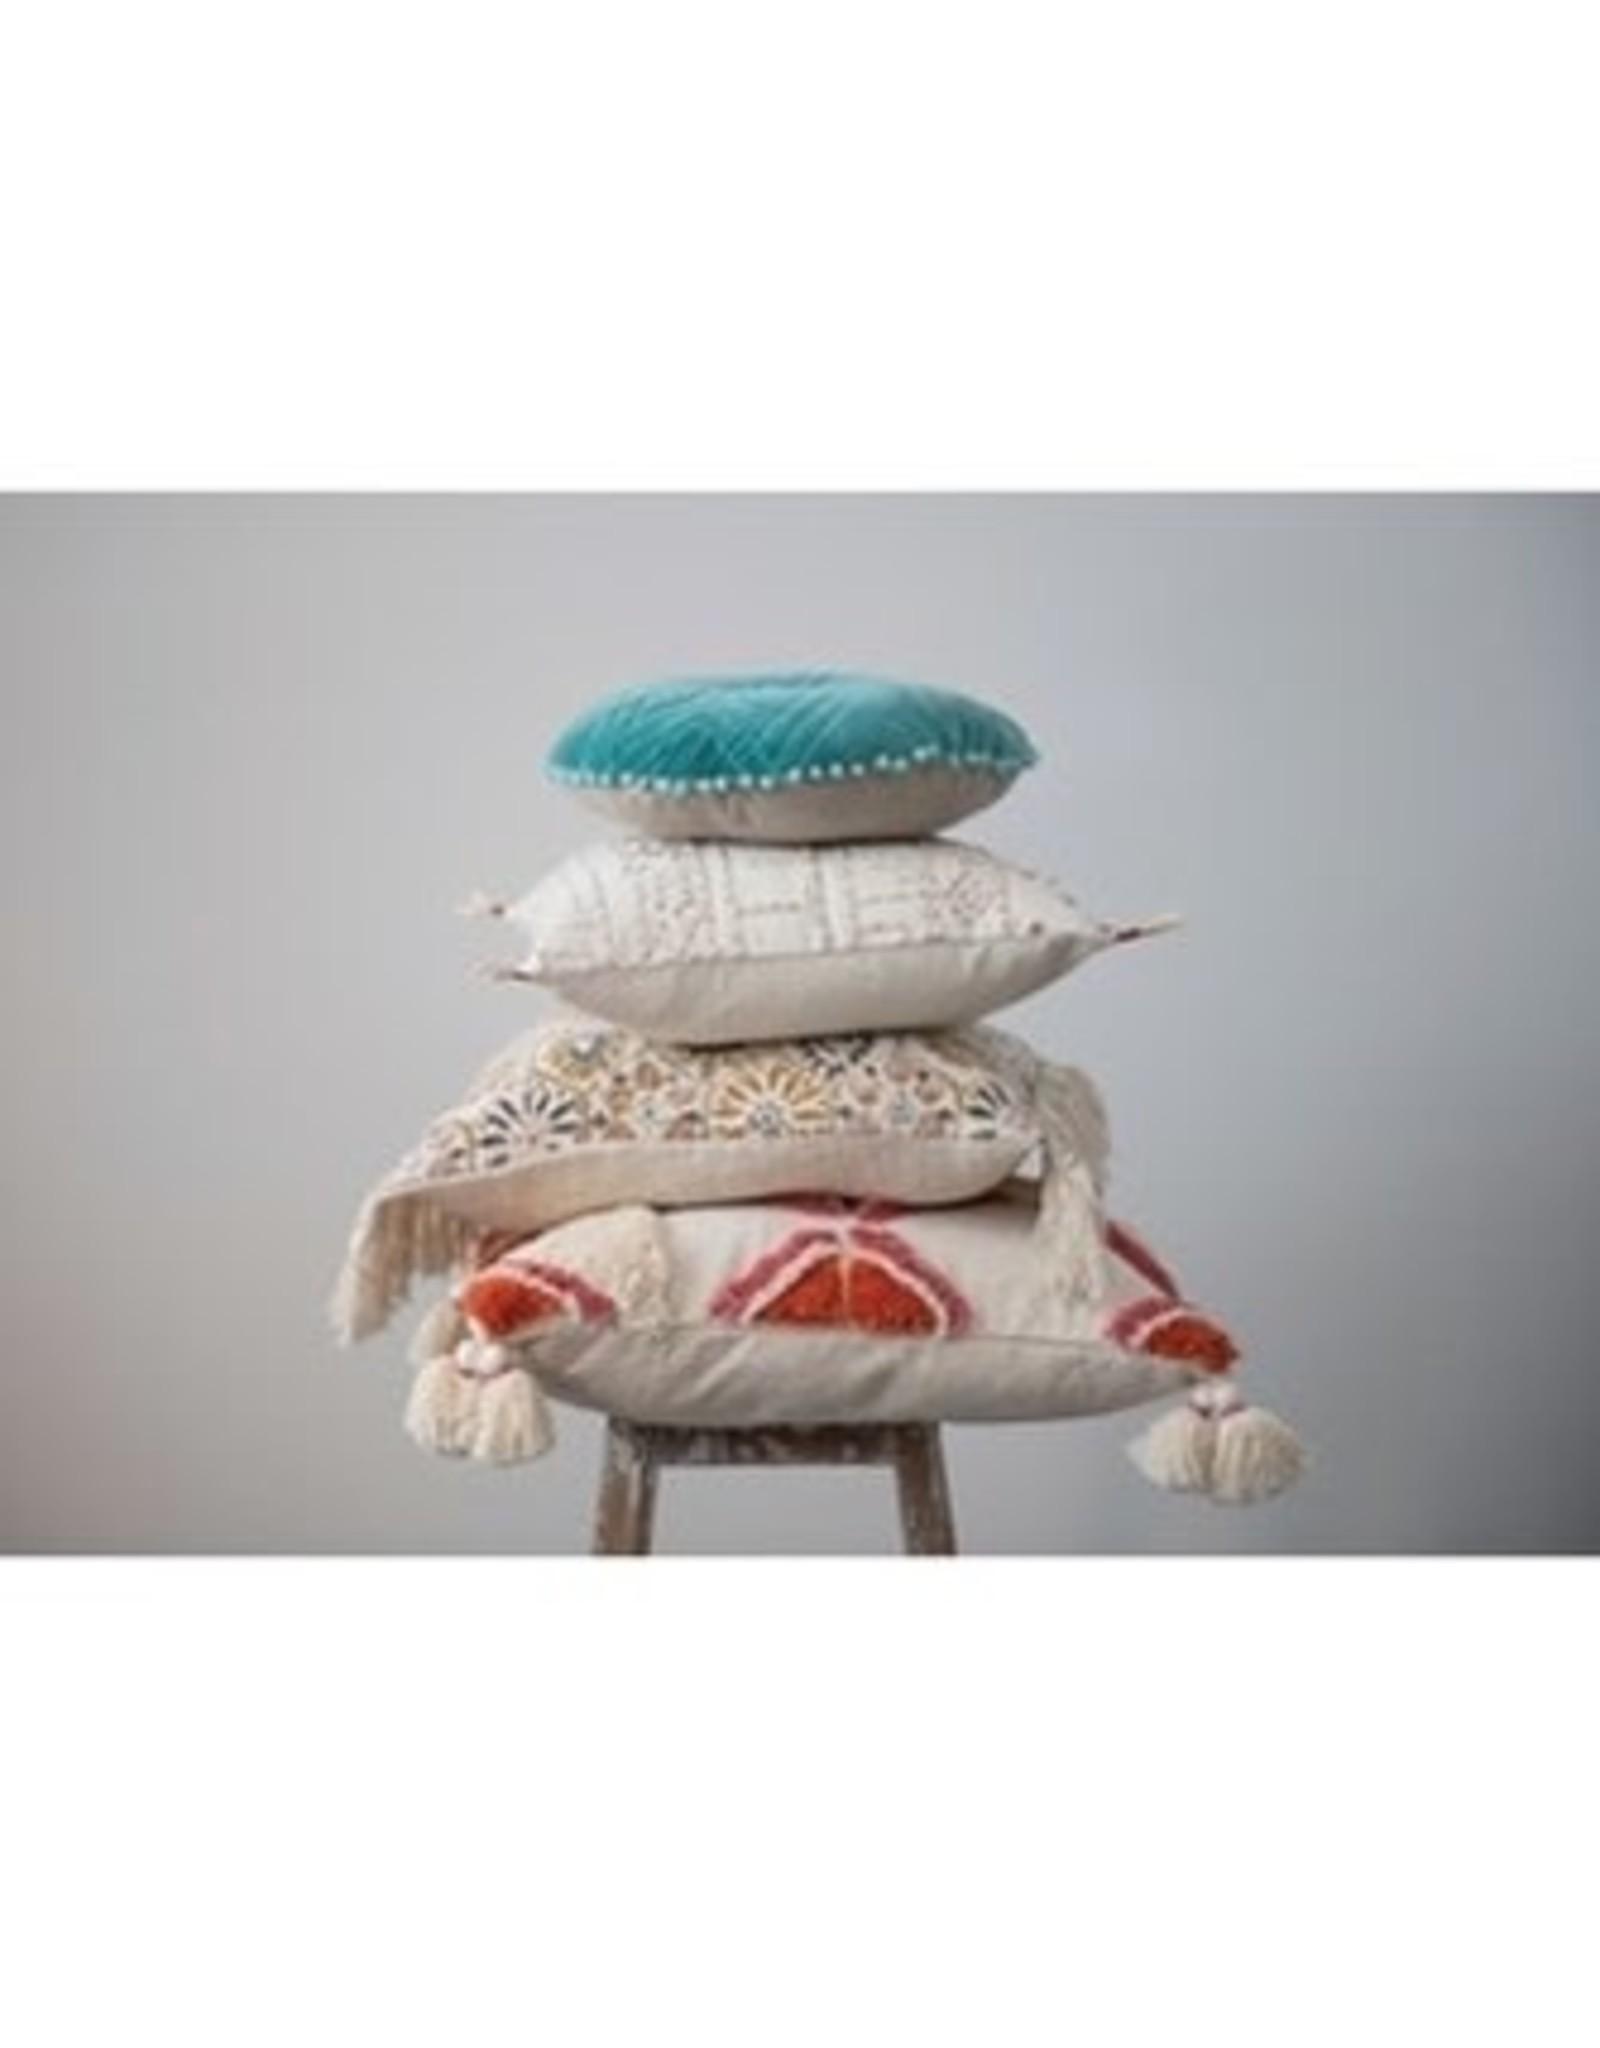 "The Florist & The Merchant 16"" Velvet Embroidered Pillow - Turquoise"